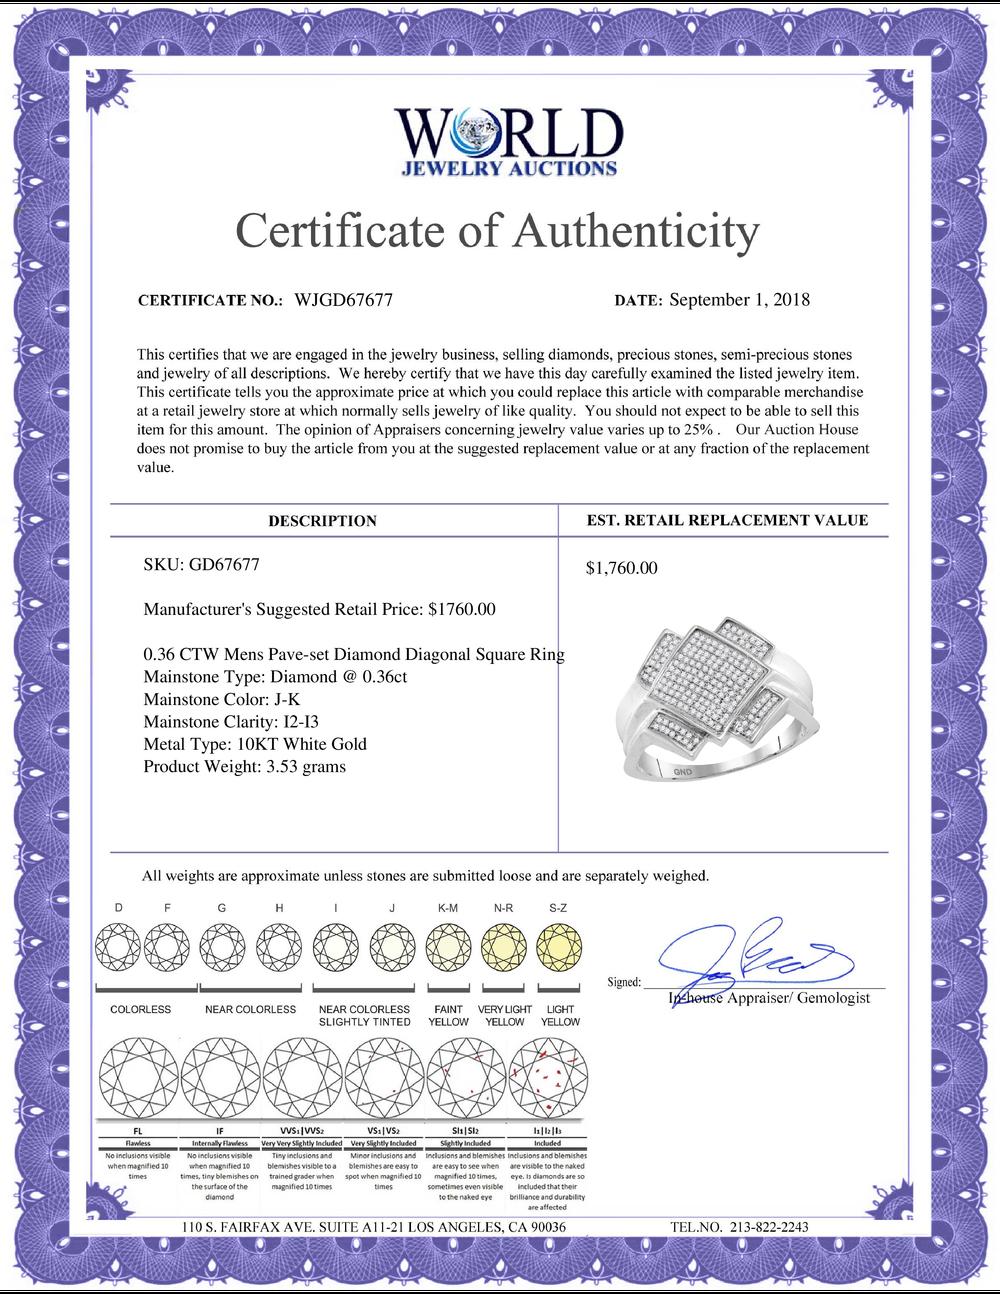 Lot 3142: 0.36 CTW Mens Pave-set Diamond Diagonal Square Cluster Ring 10KT White Gold - REF-44H9M